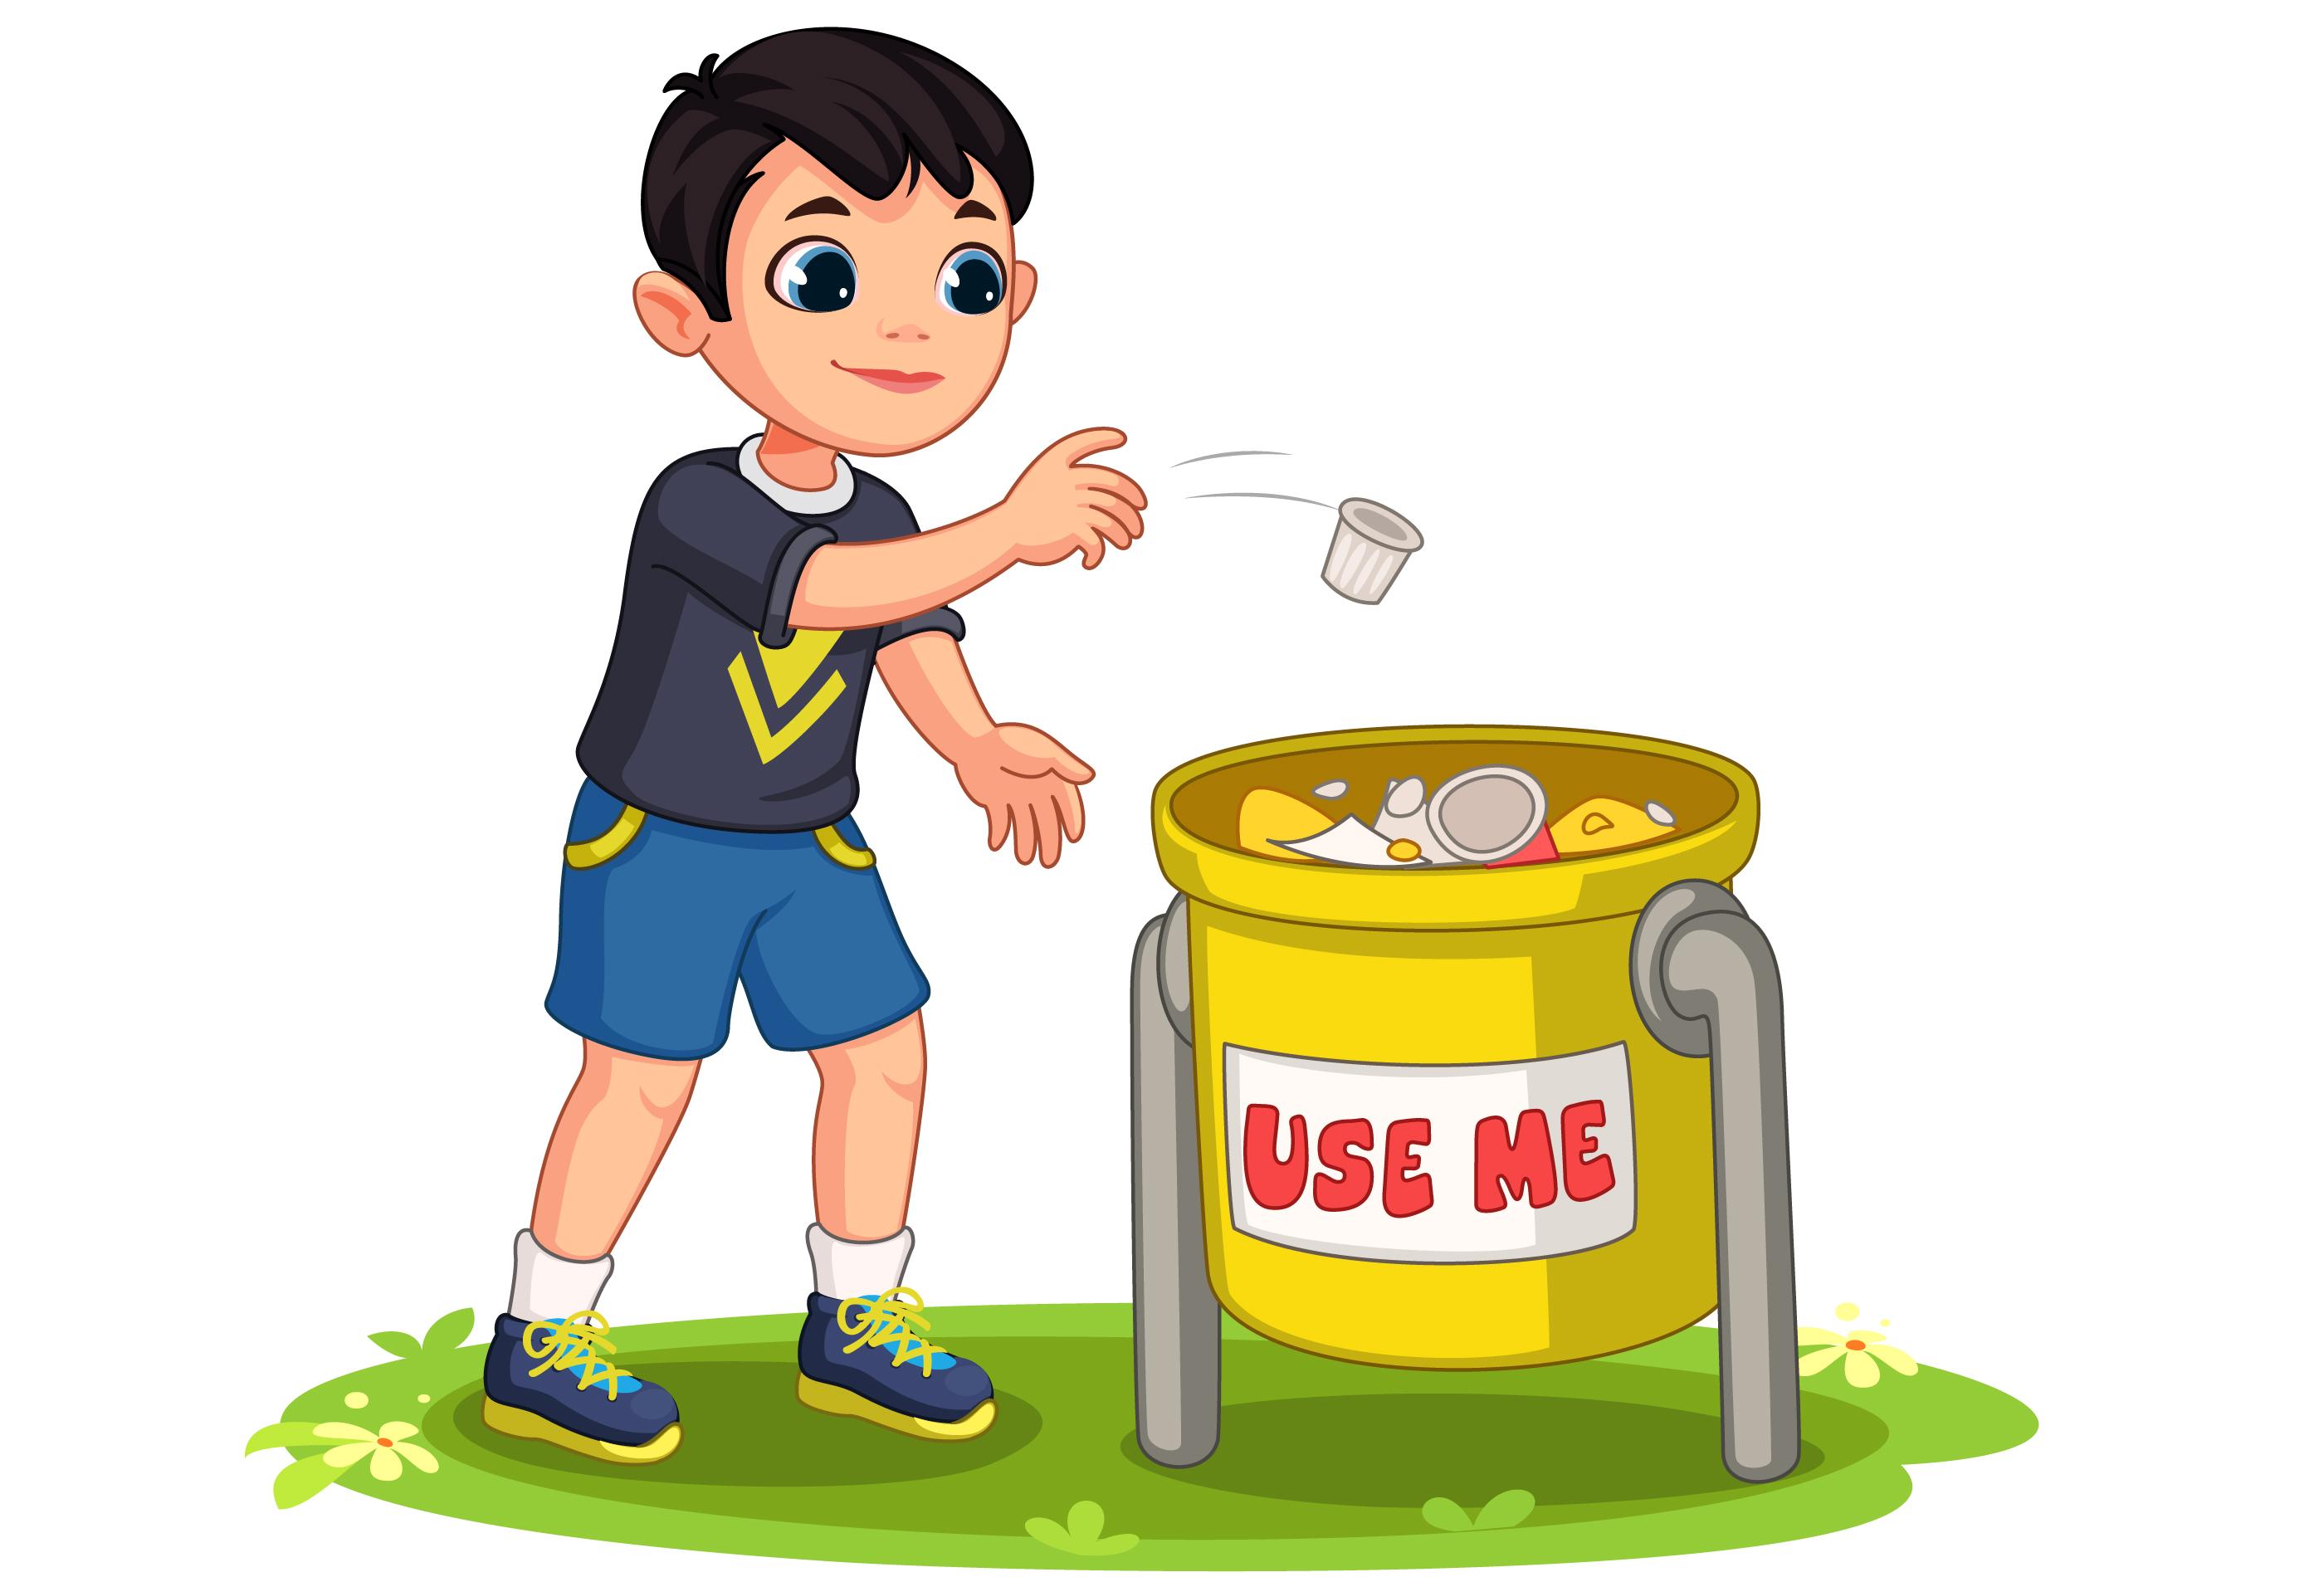 Take out the trash stock illustration. Illustration of city - 144211377